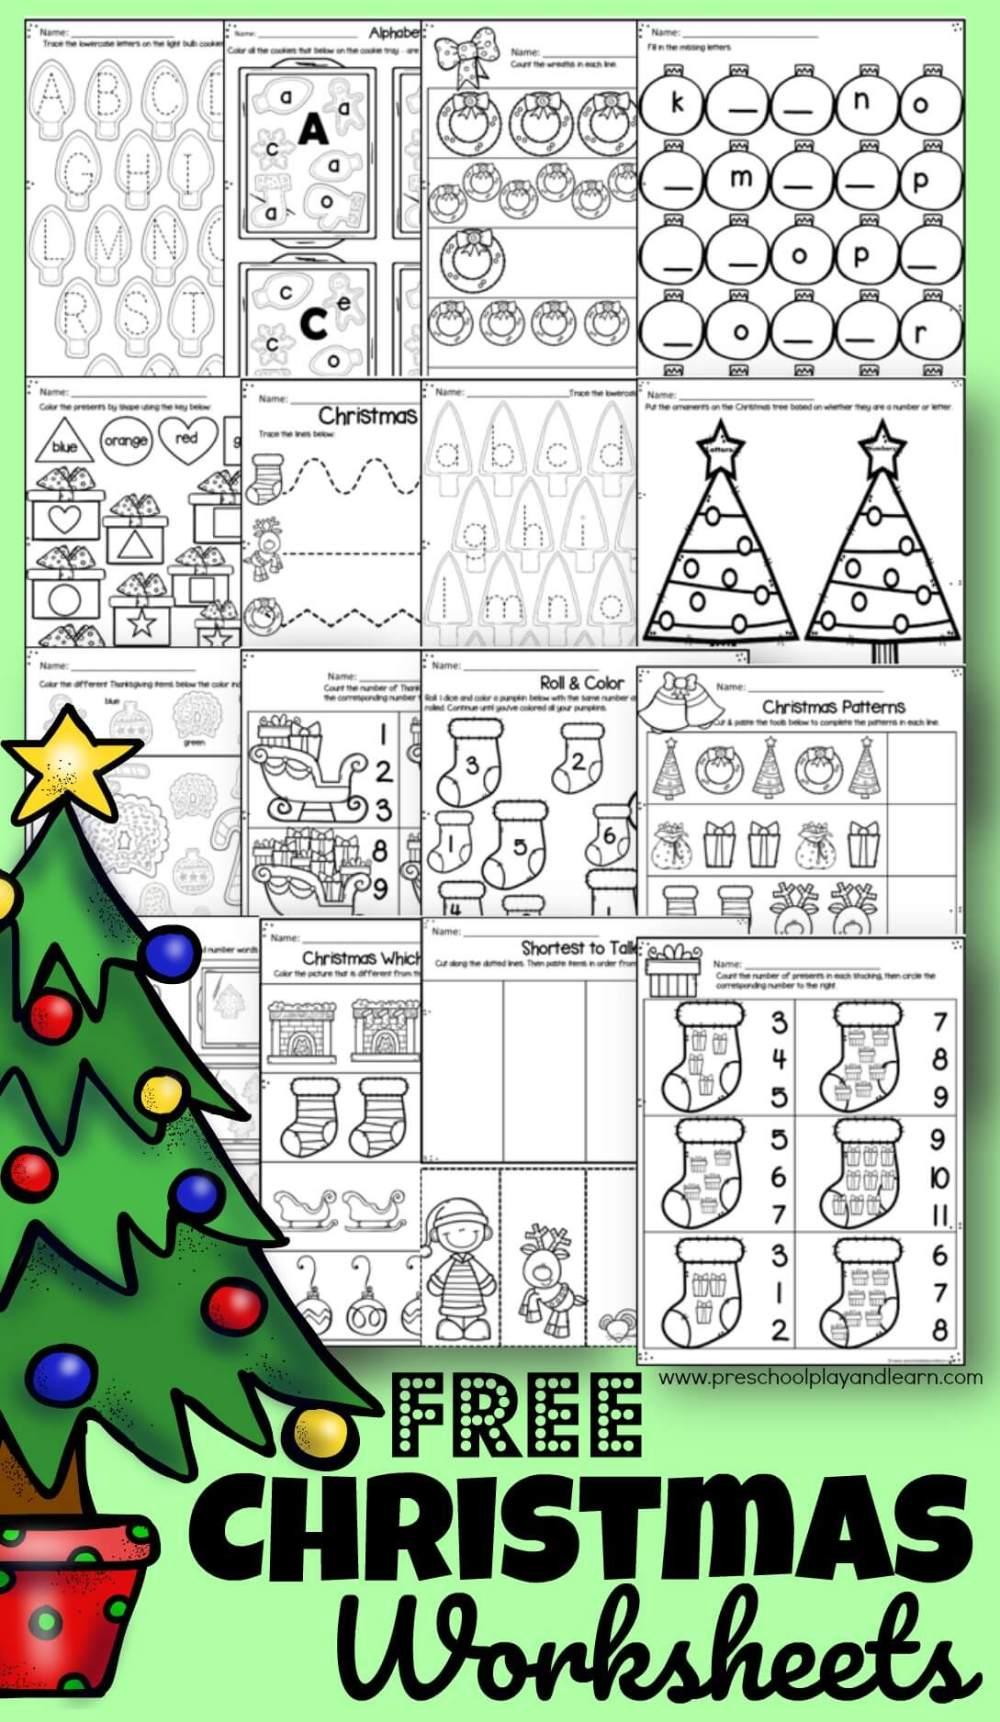 medium resolution of 🎄 FREE Christmas Worksheets for Preschool